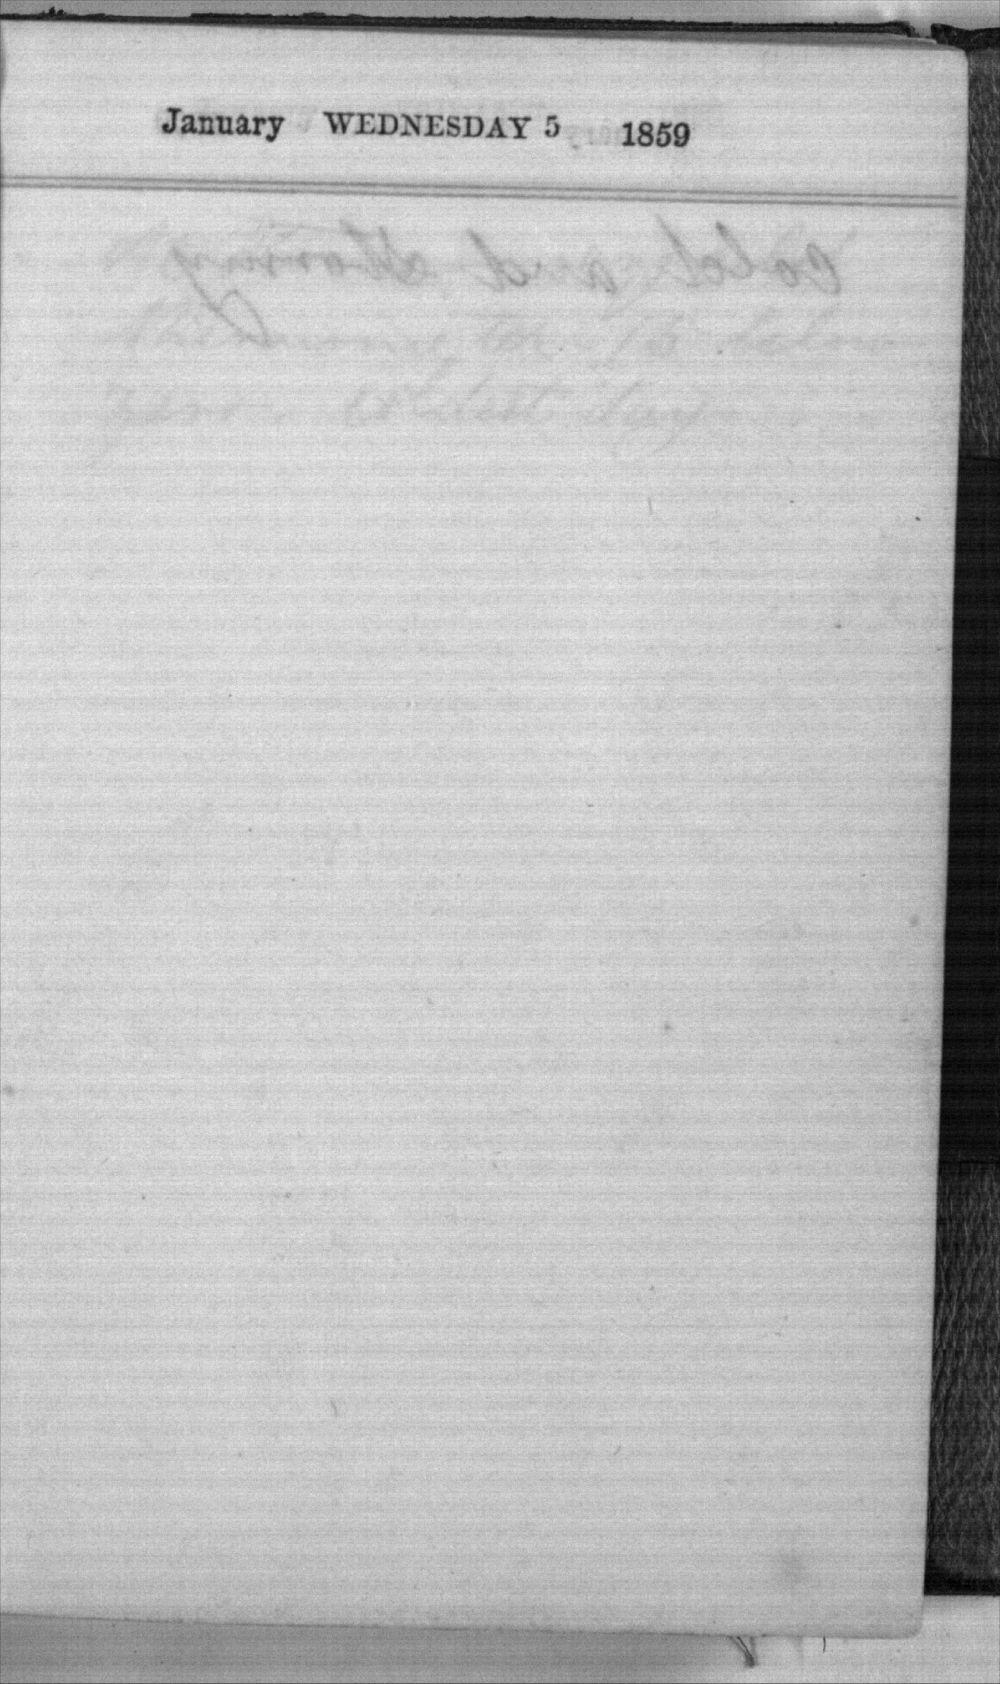 Daniel Mulford Valentine's diary - Jan 5